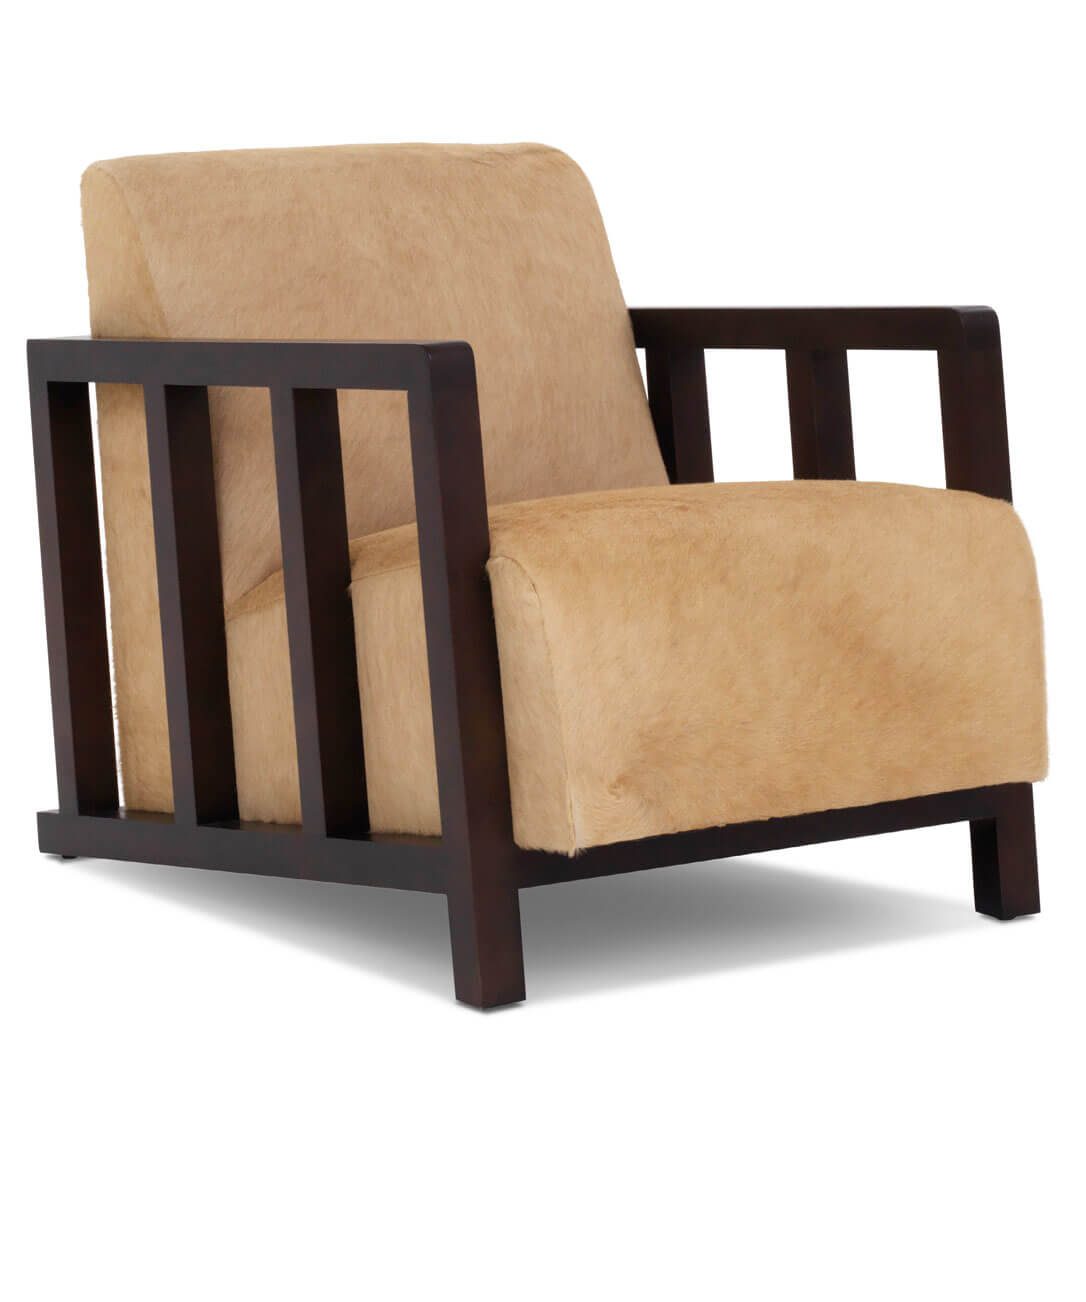 Pickett Chair